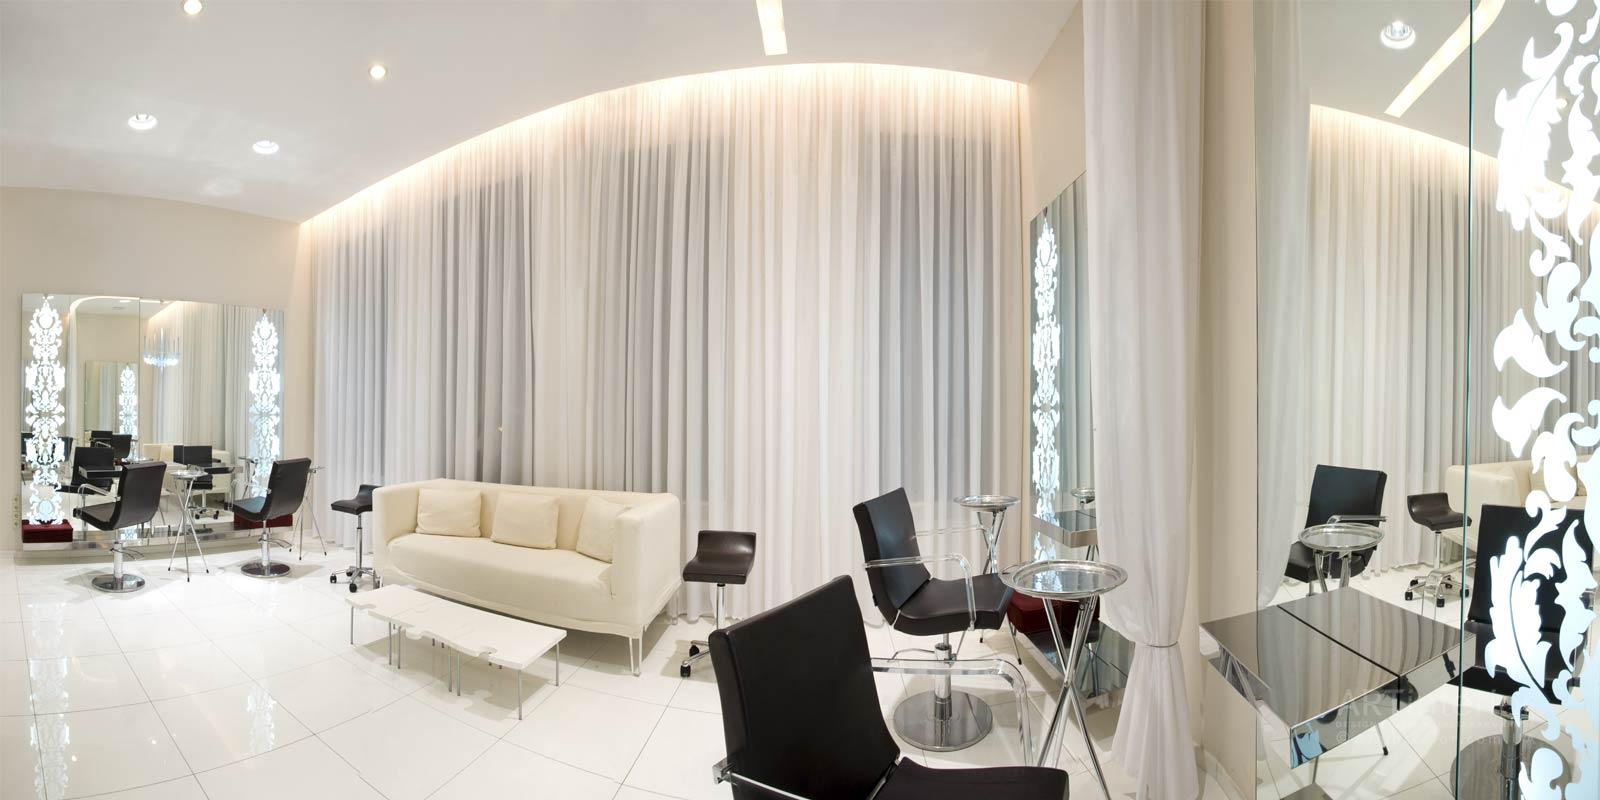 салон красоты | Дизайн и стиль интерьера квартиры, дома, офиса от «Artinterior», Киев, artinterior.com.ua